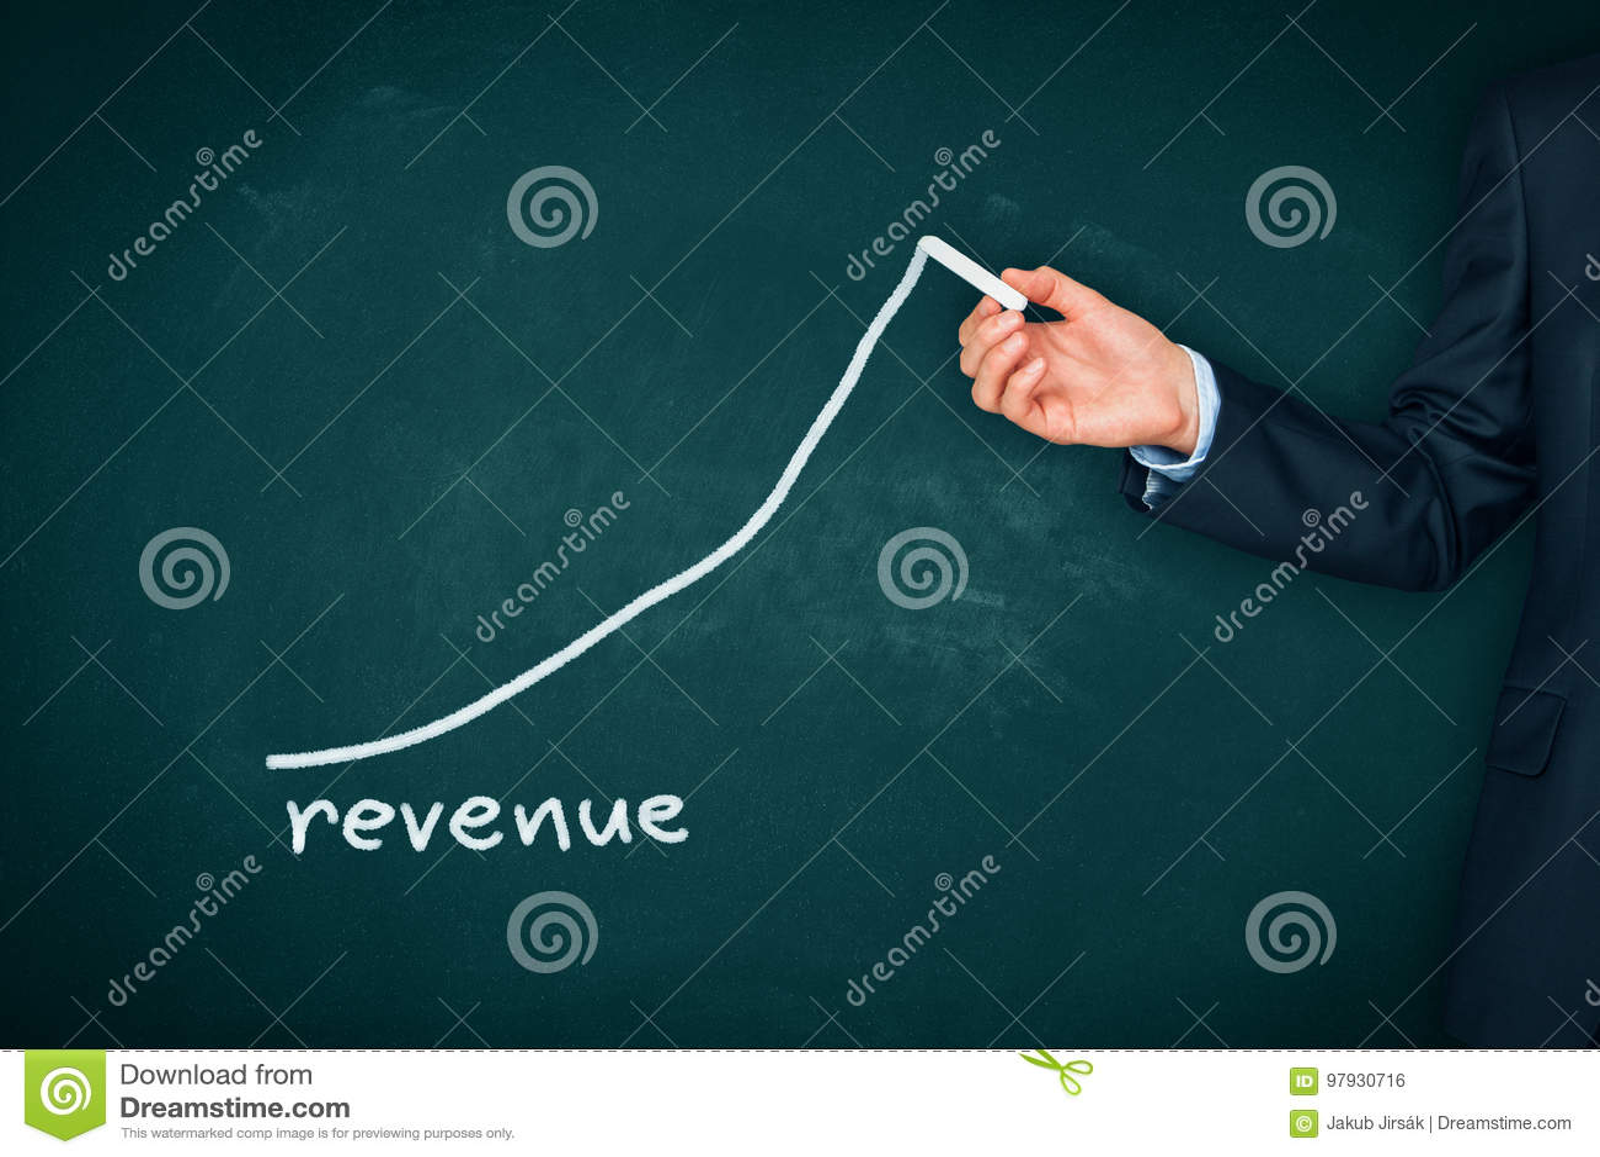 Aumento do rendimento